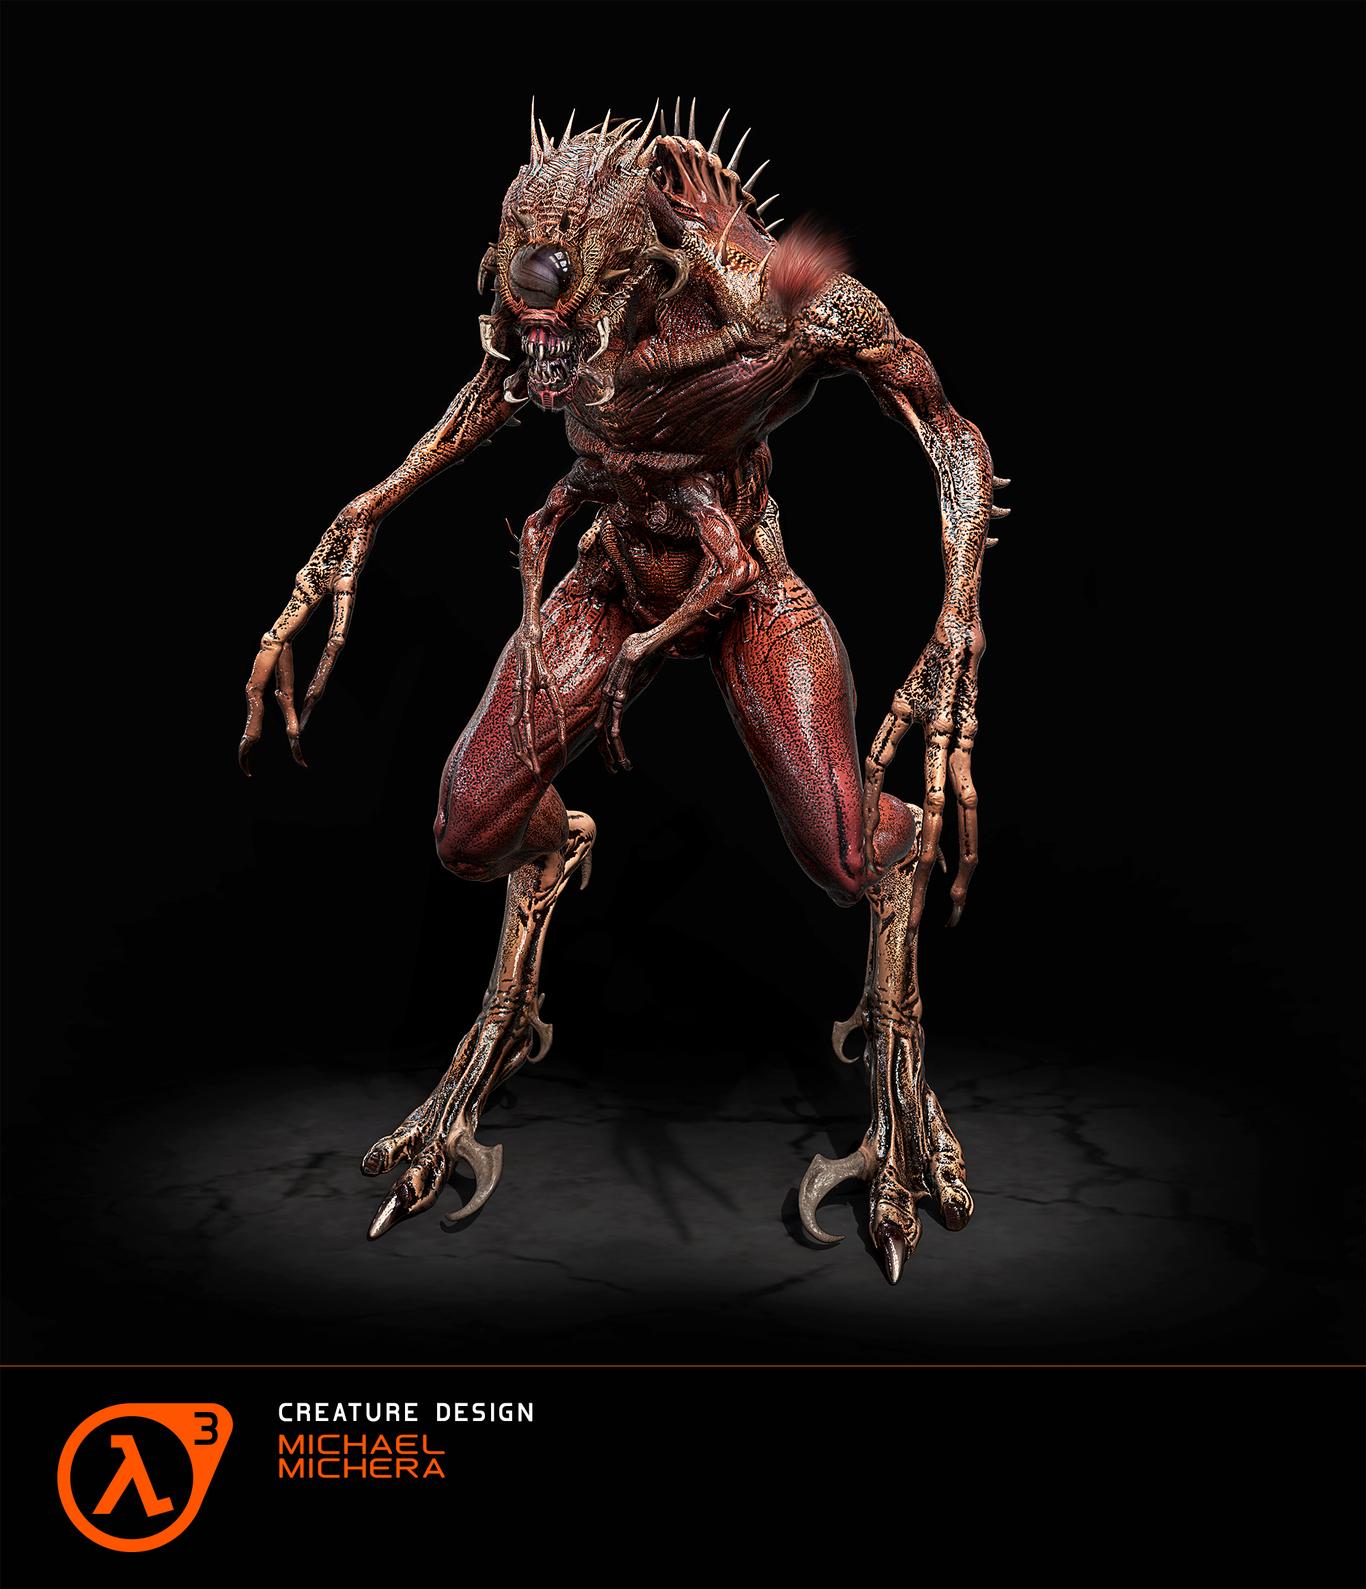 Half Life 3 - Vortigaunts' Beast